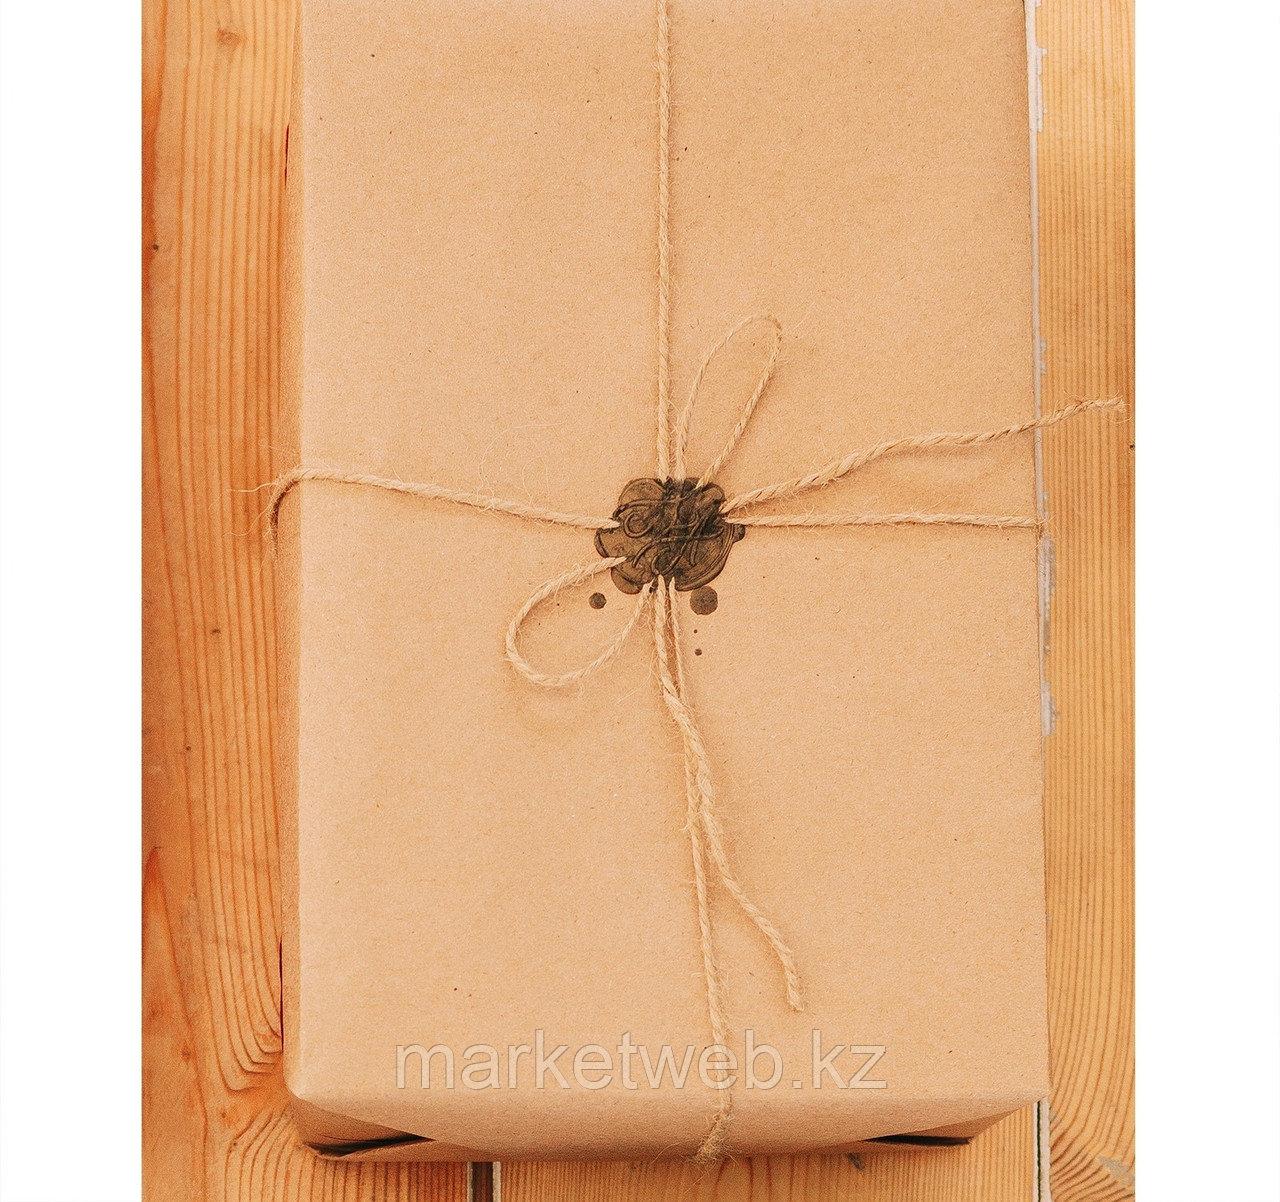 Бумага упаковочная крафт 0,72 x 50 м - фото 4